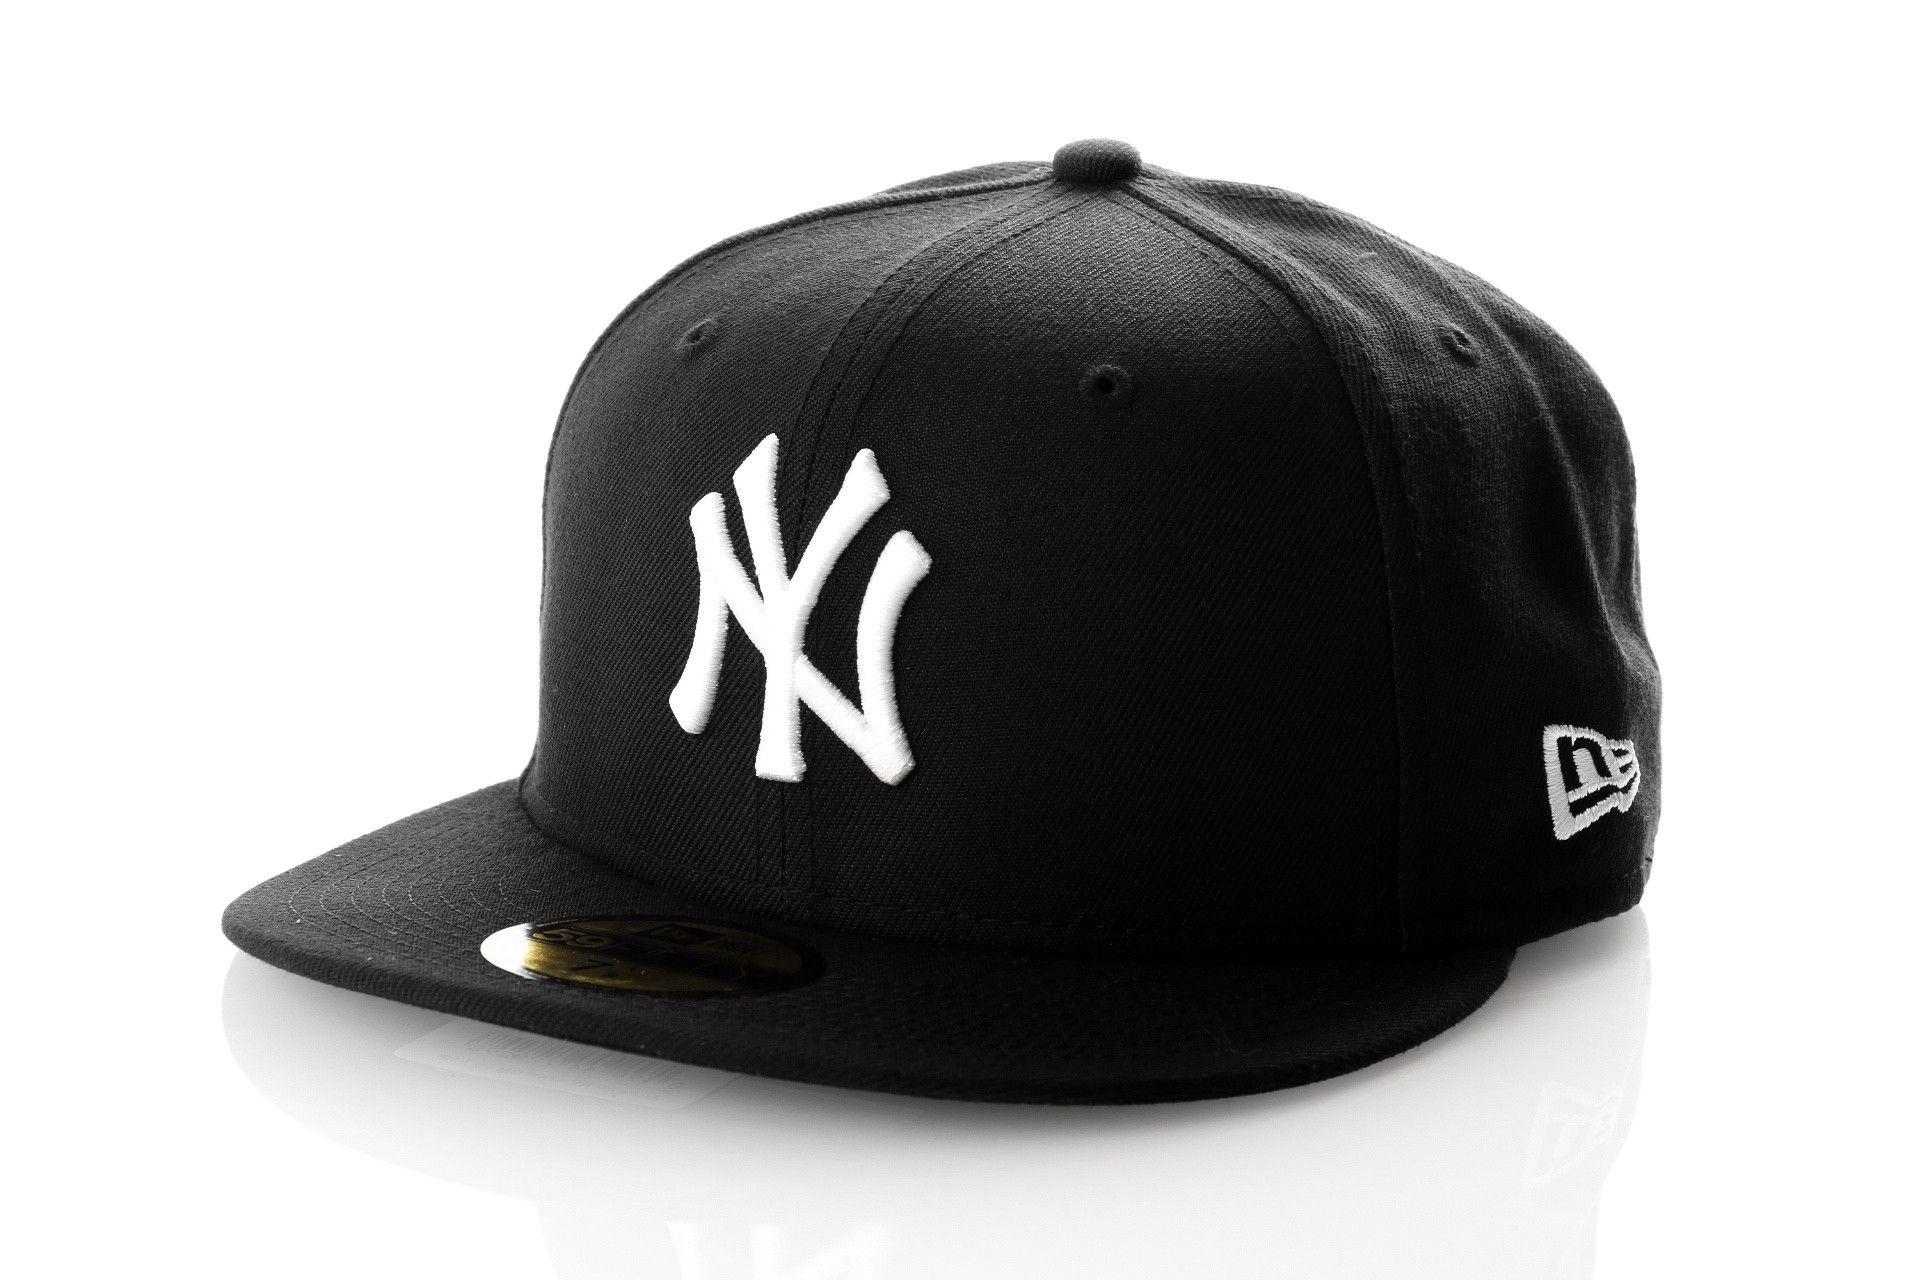 Afbeelding van New Era Fitted Cap New York Yankees AC PERF 5950 NEW YORK YANKEE 70331909